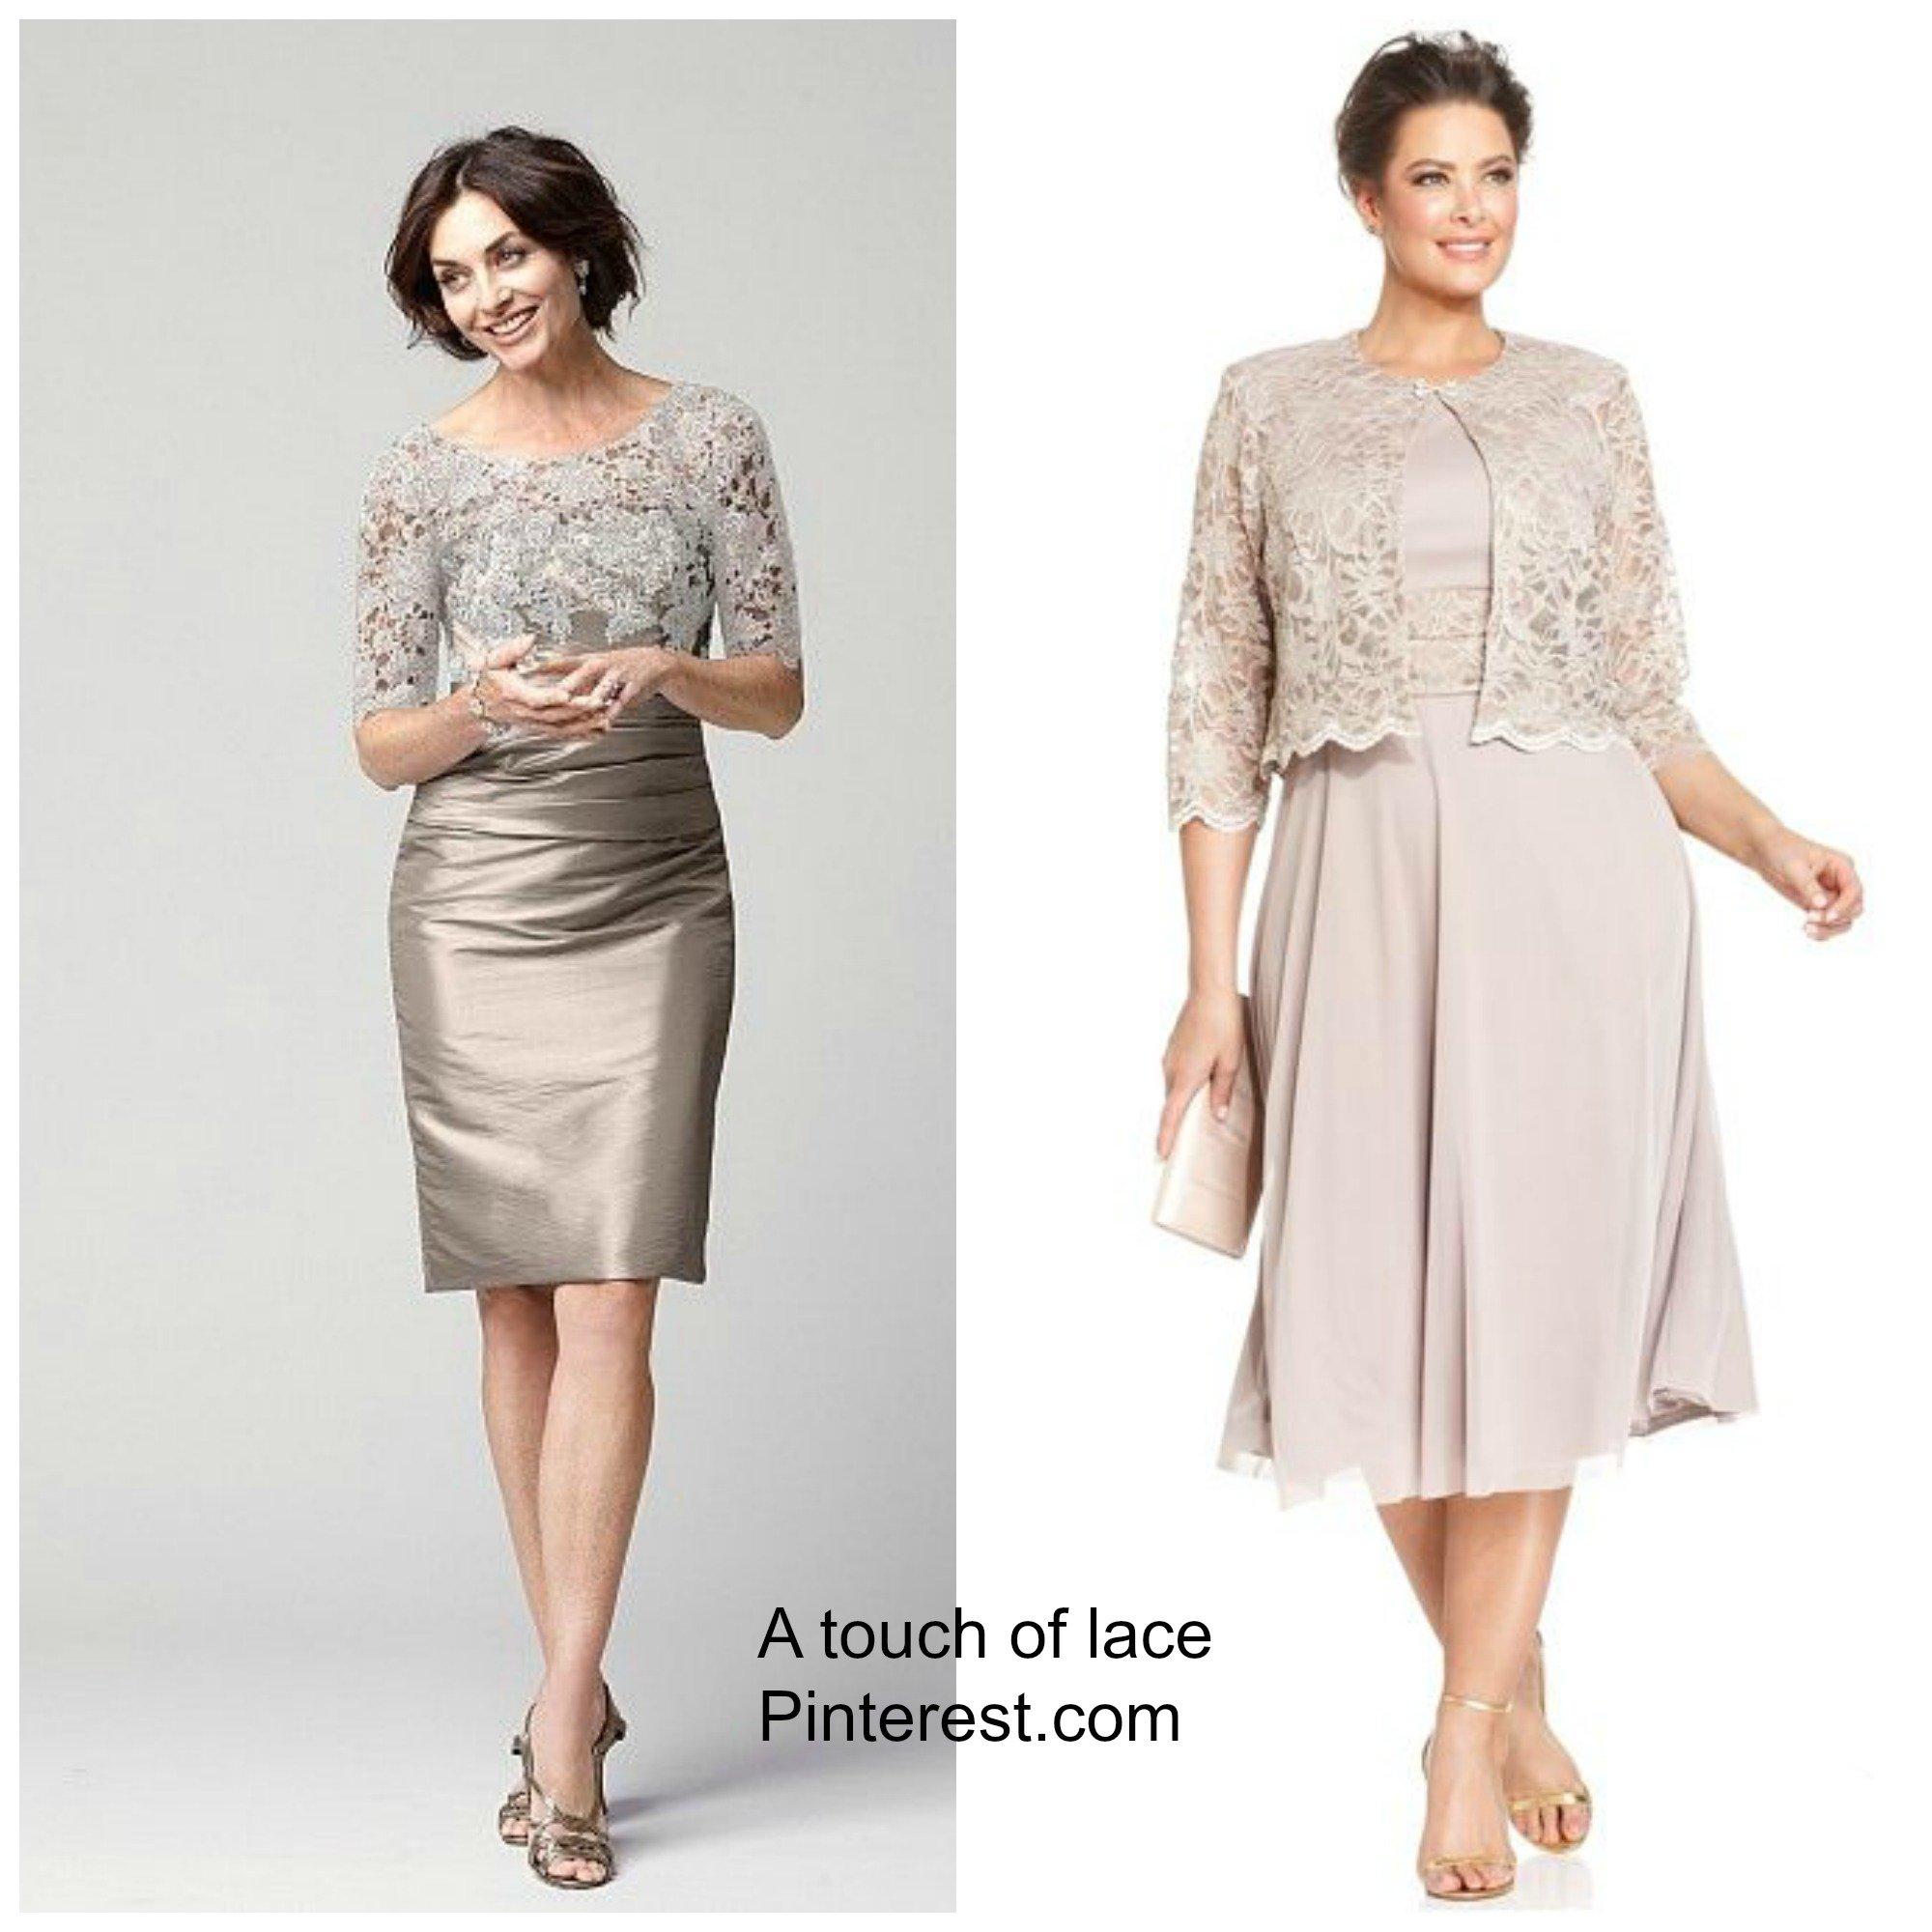 Tips To Avoid Mother Of The Bride Dress Drama,Zuhair Murad Sofia Vergara Wedding Dress